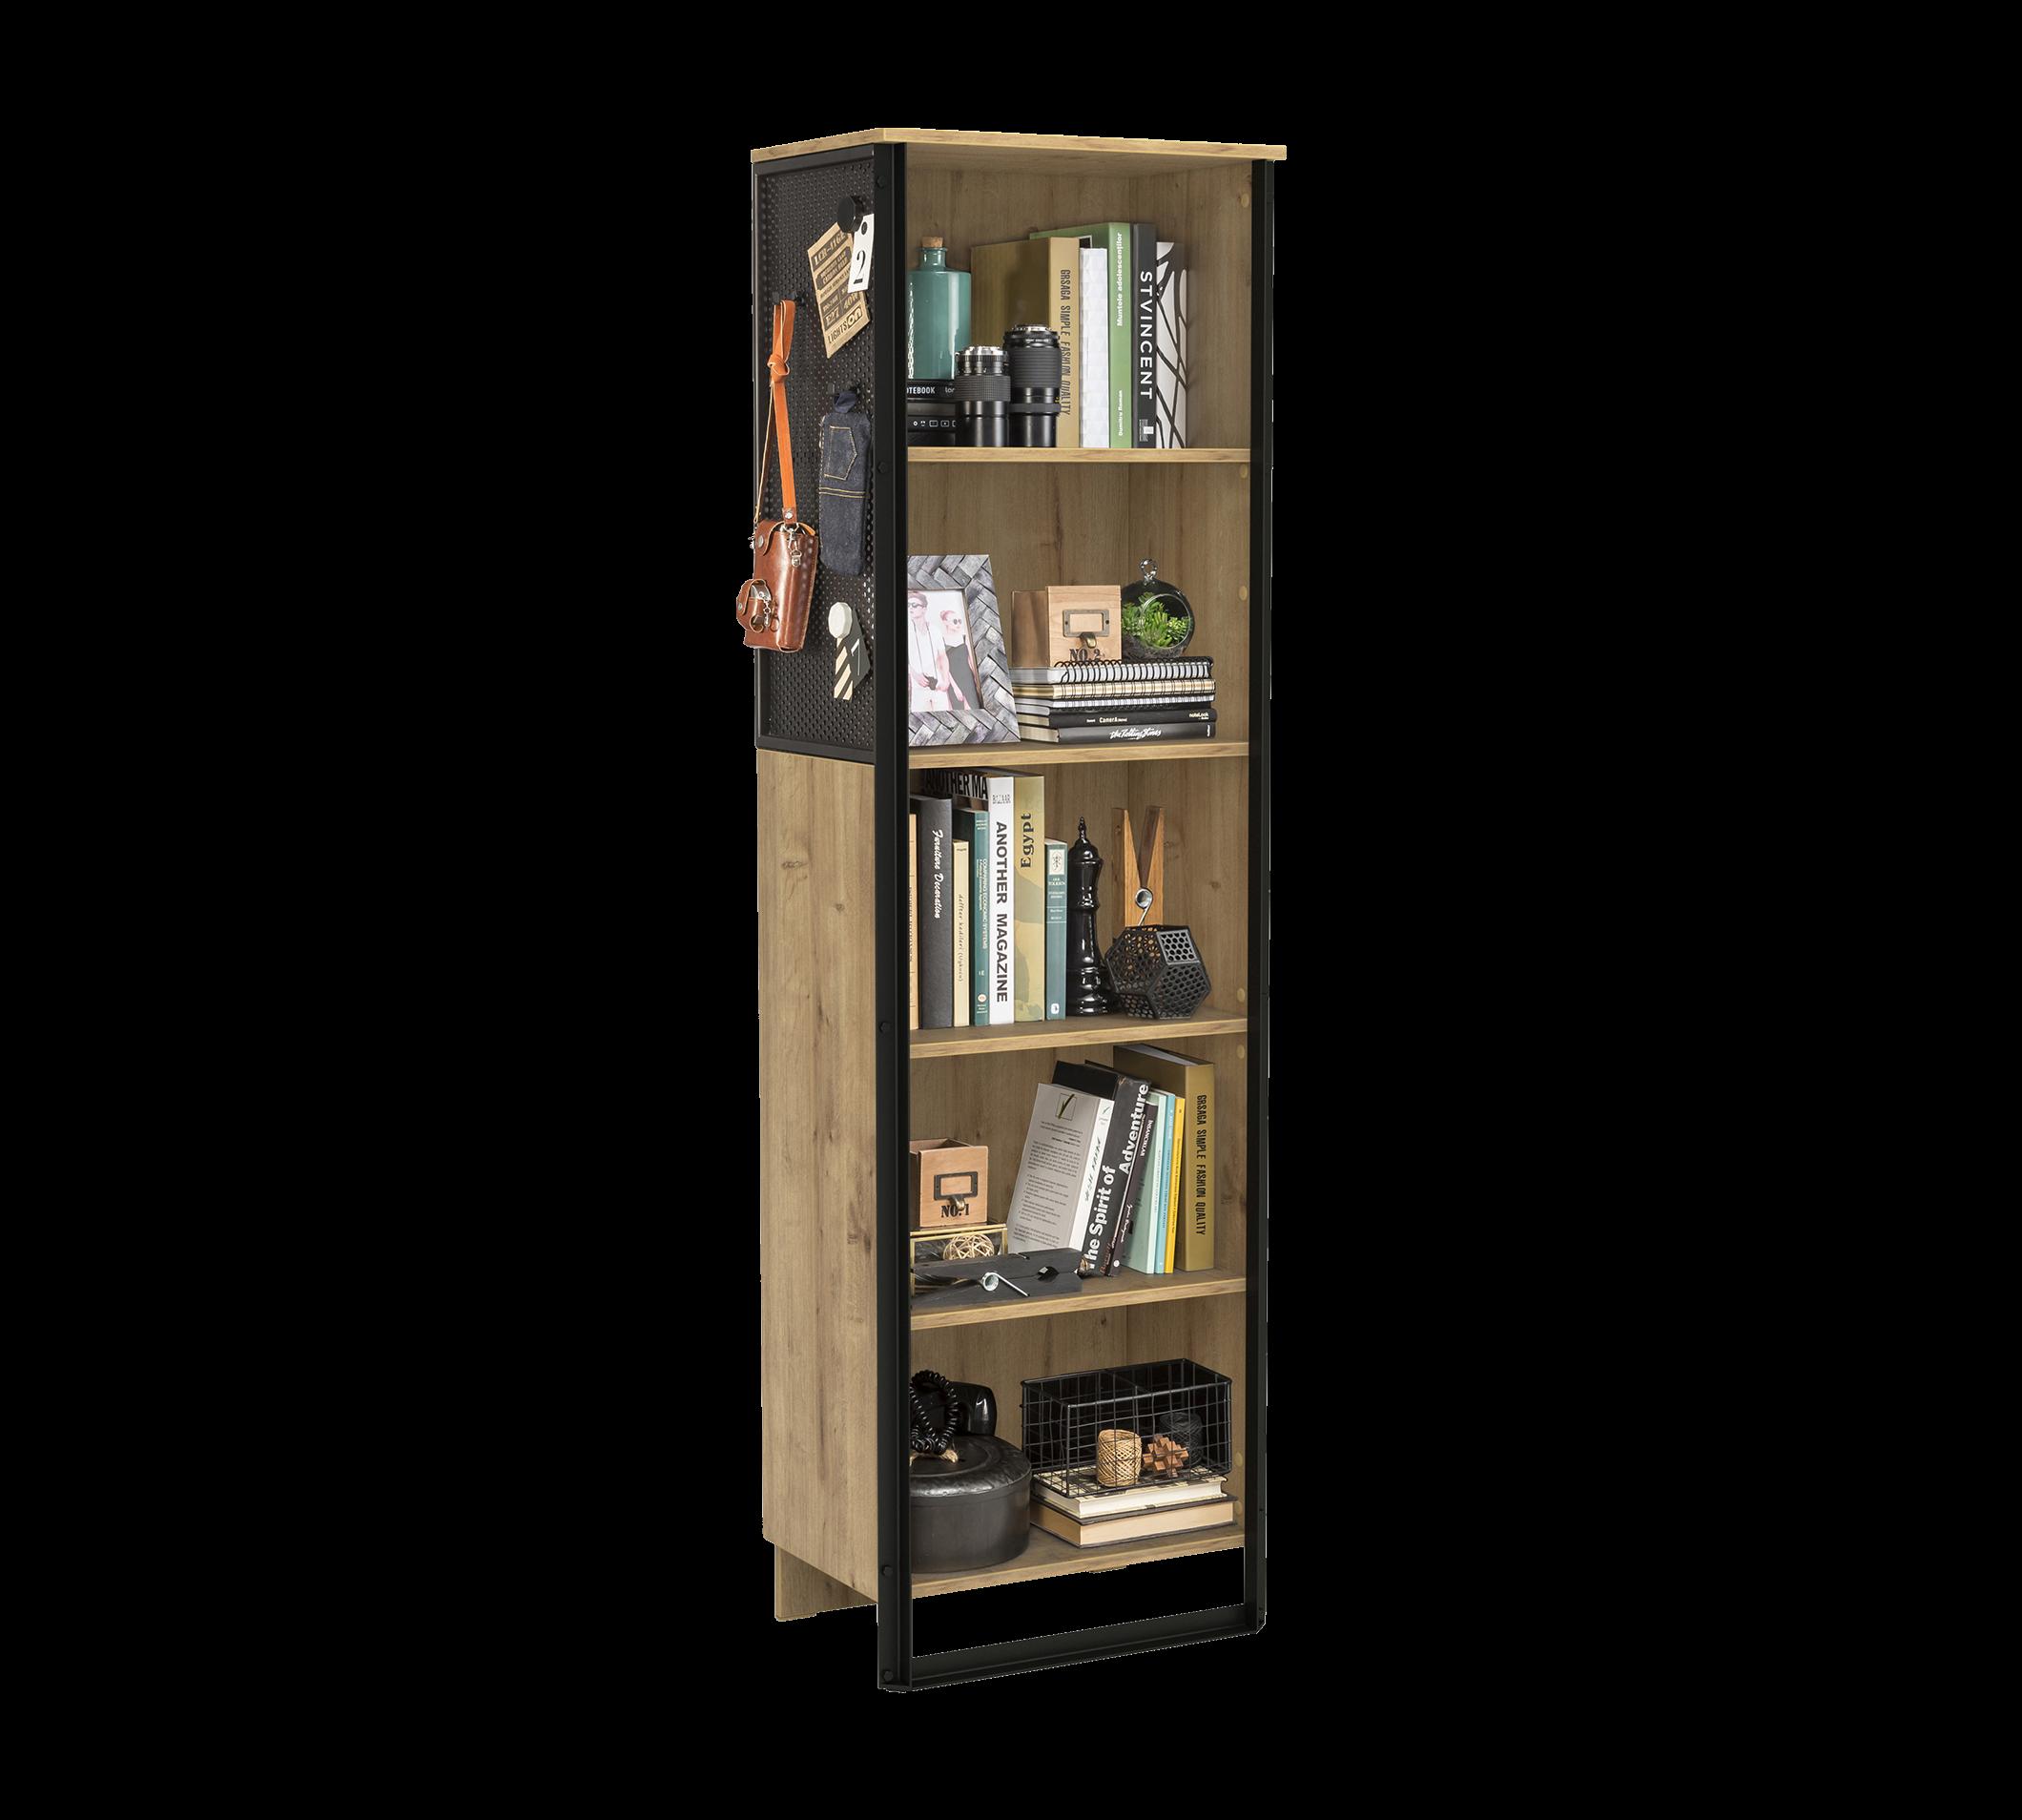 Biblioteca din pal si metal pentru tineret Wood Metal Natural / Negru, l53xA35xH180 cm